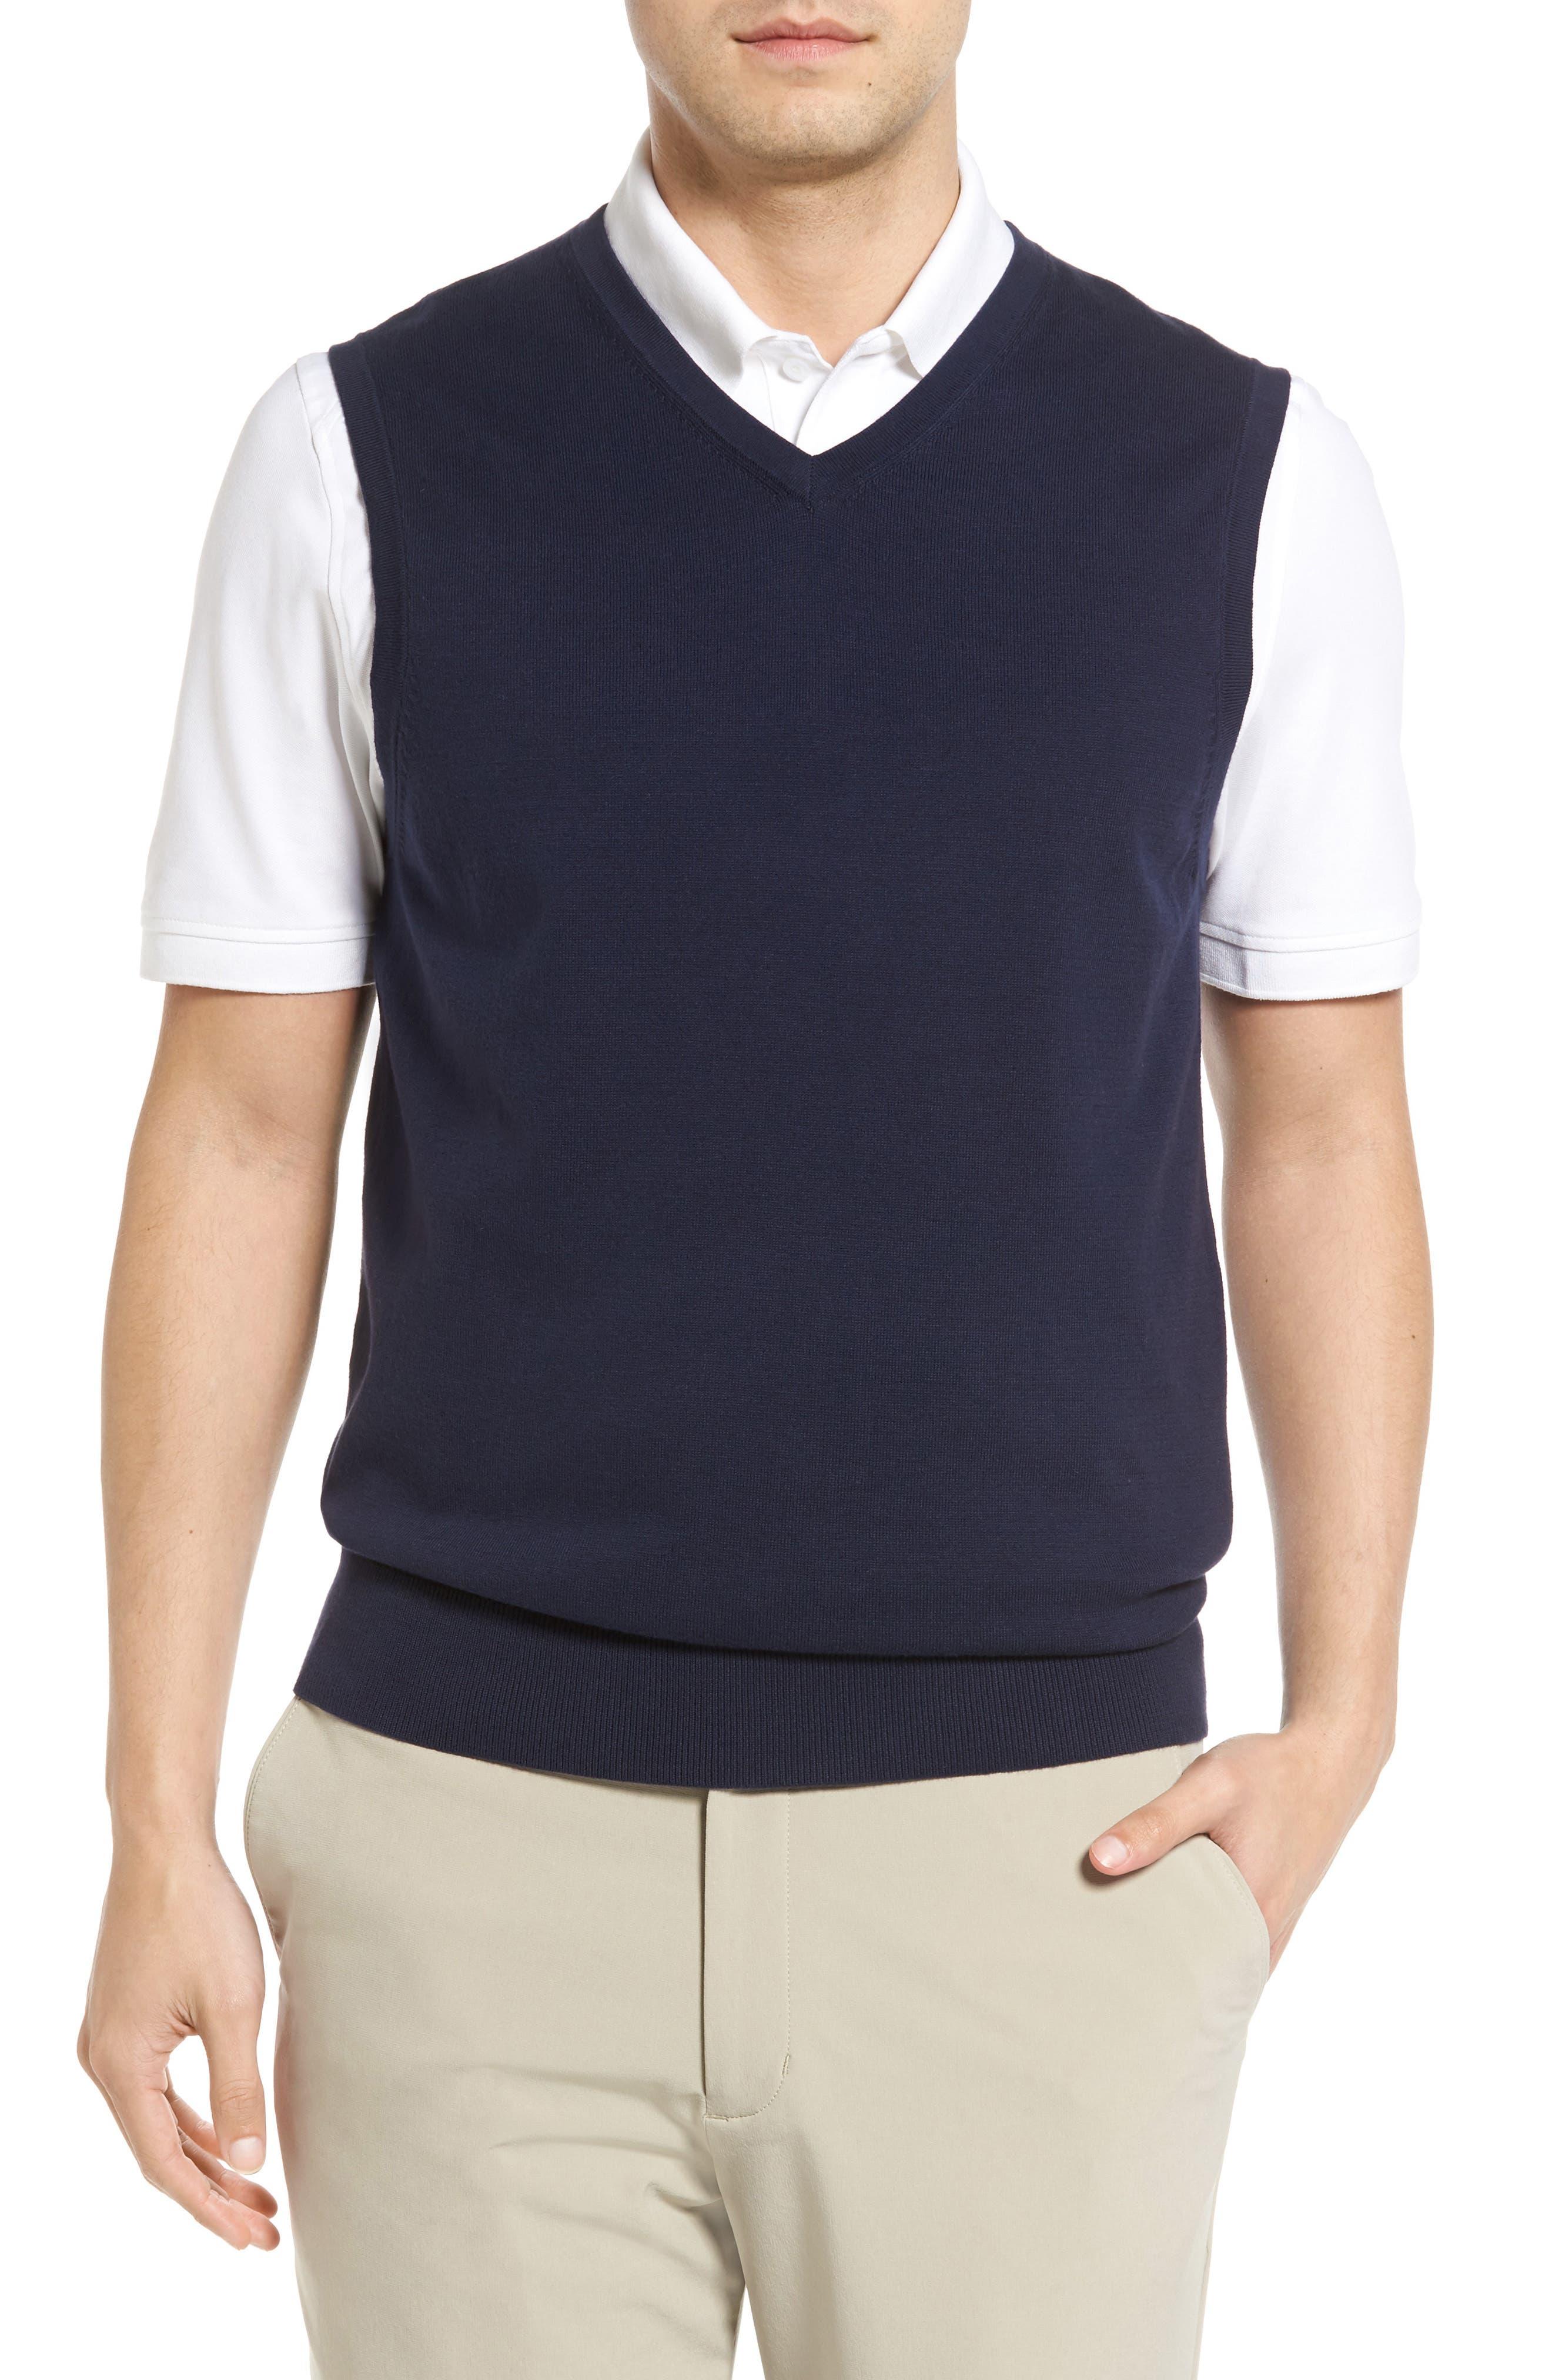 Main Image - Cutter & Buck Lakemont V-Neck Sweater Vest